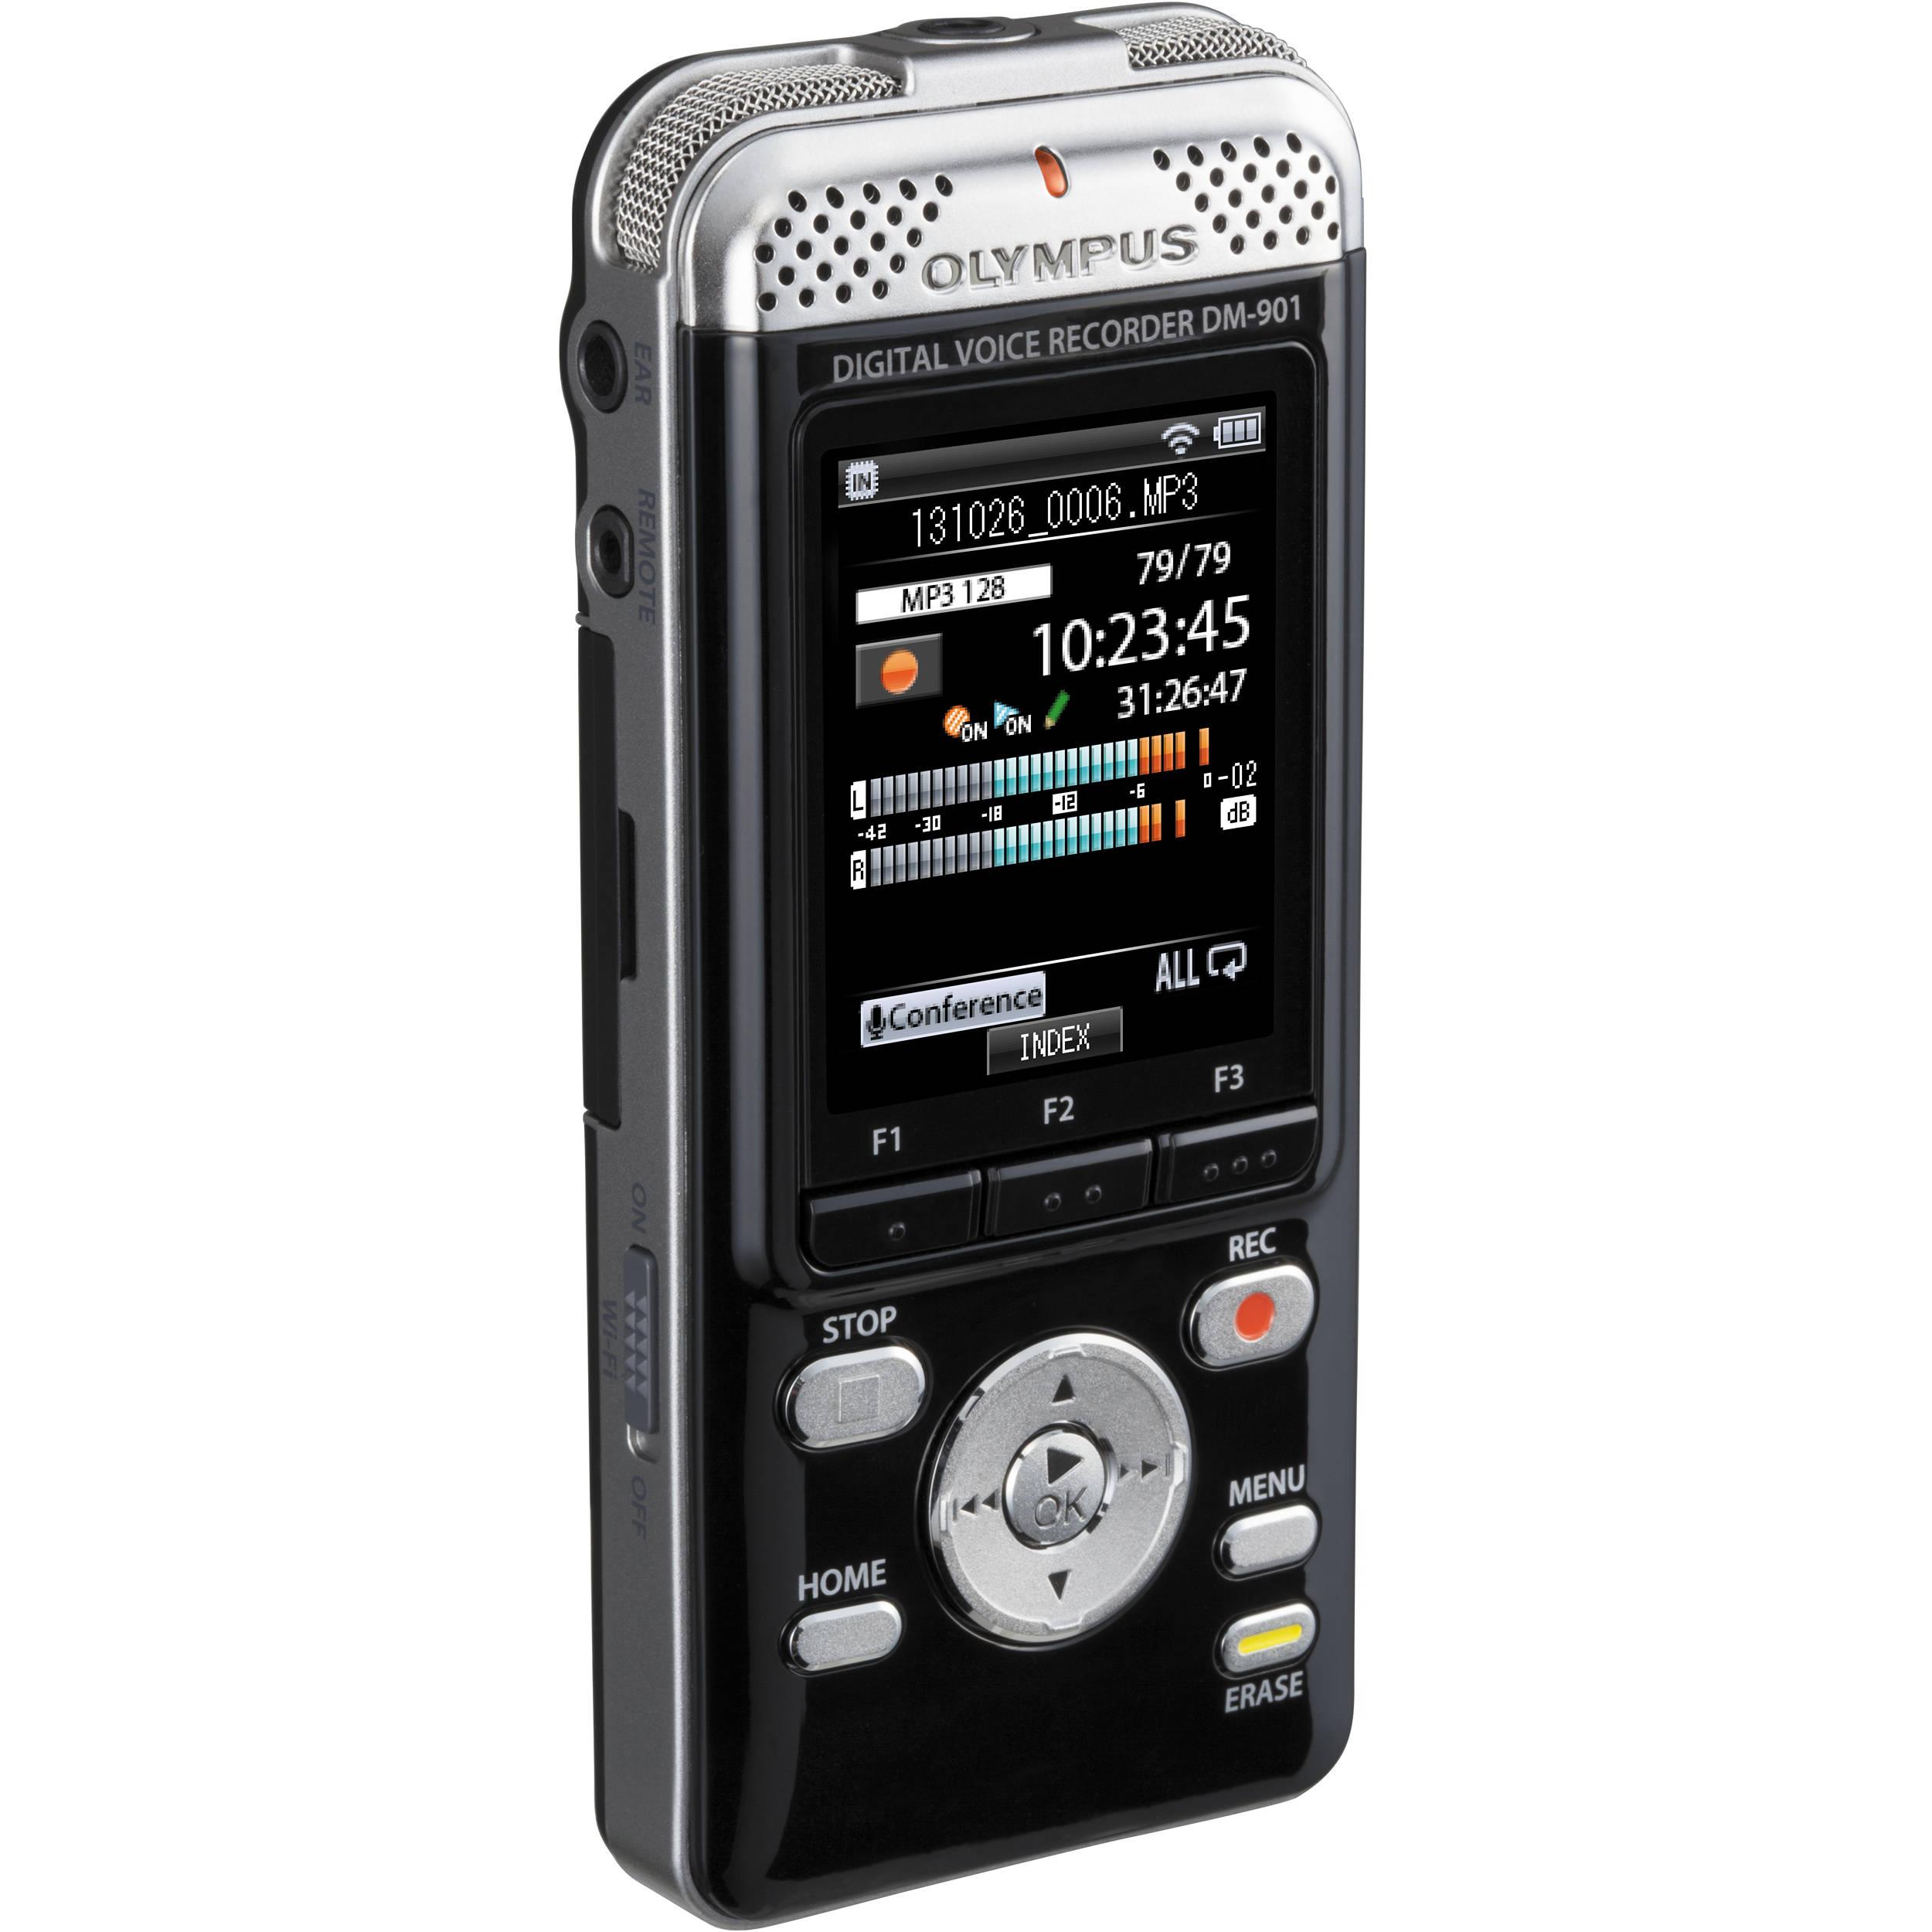 olympus 4gb dm 901 digital voice recorder v407141bu000 b h photo